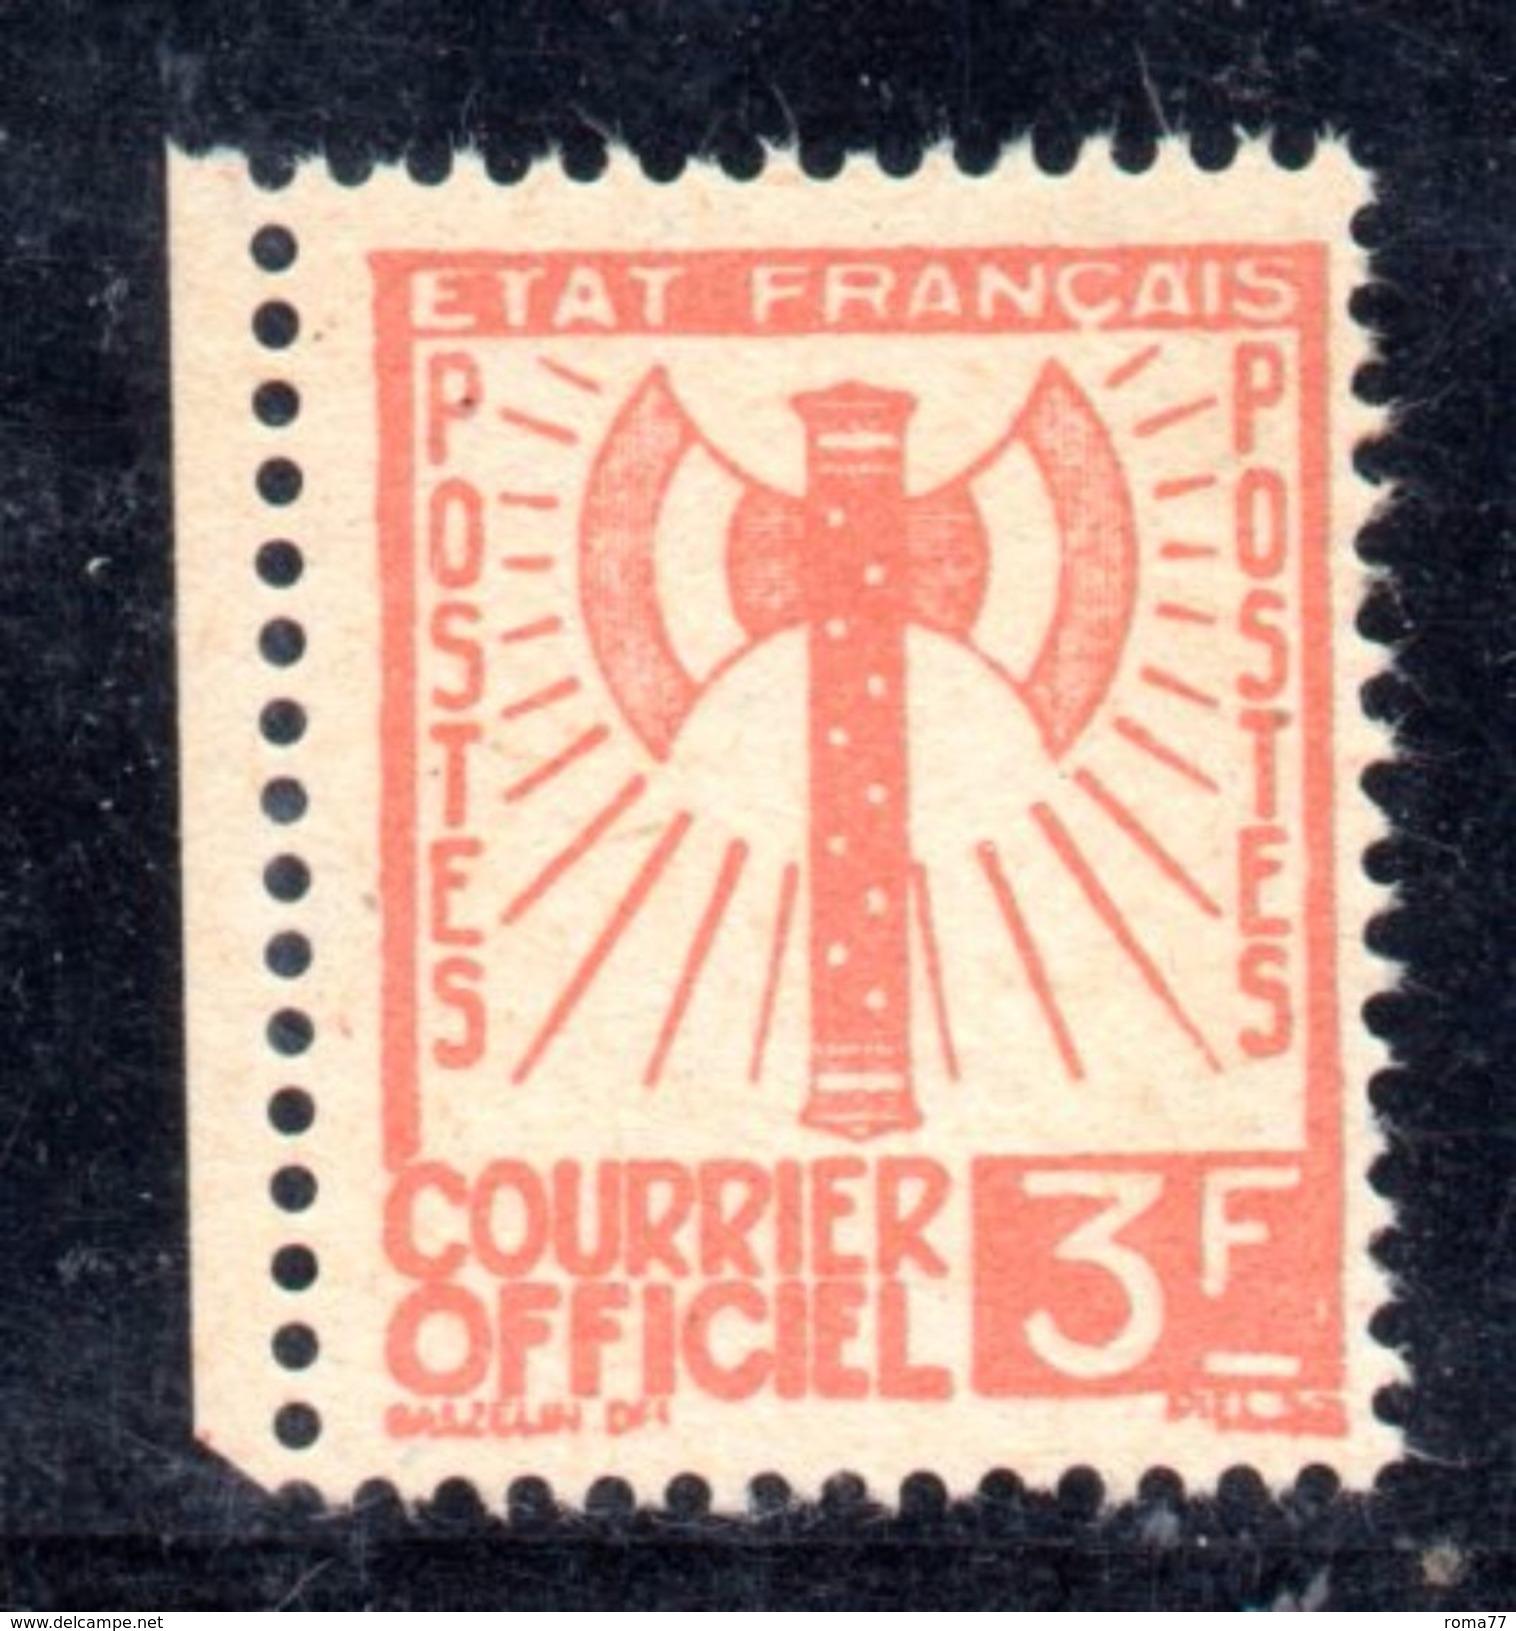 XP1582 - FRANCE Francia - 1943 - COURRIER OFFICIEL, Yvert  10 , 3 Franco Senza Gomma - Nuovi